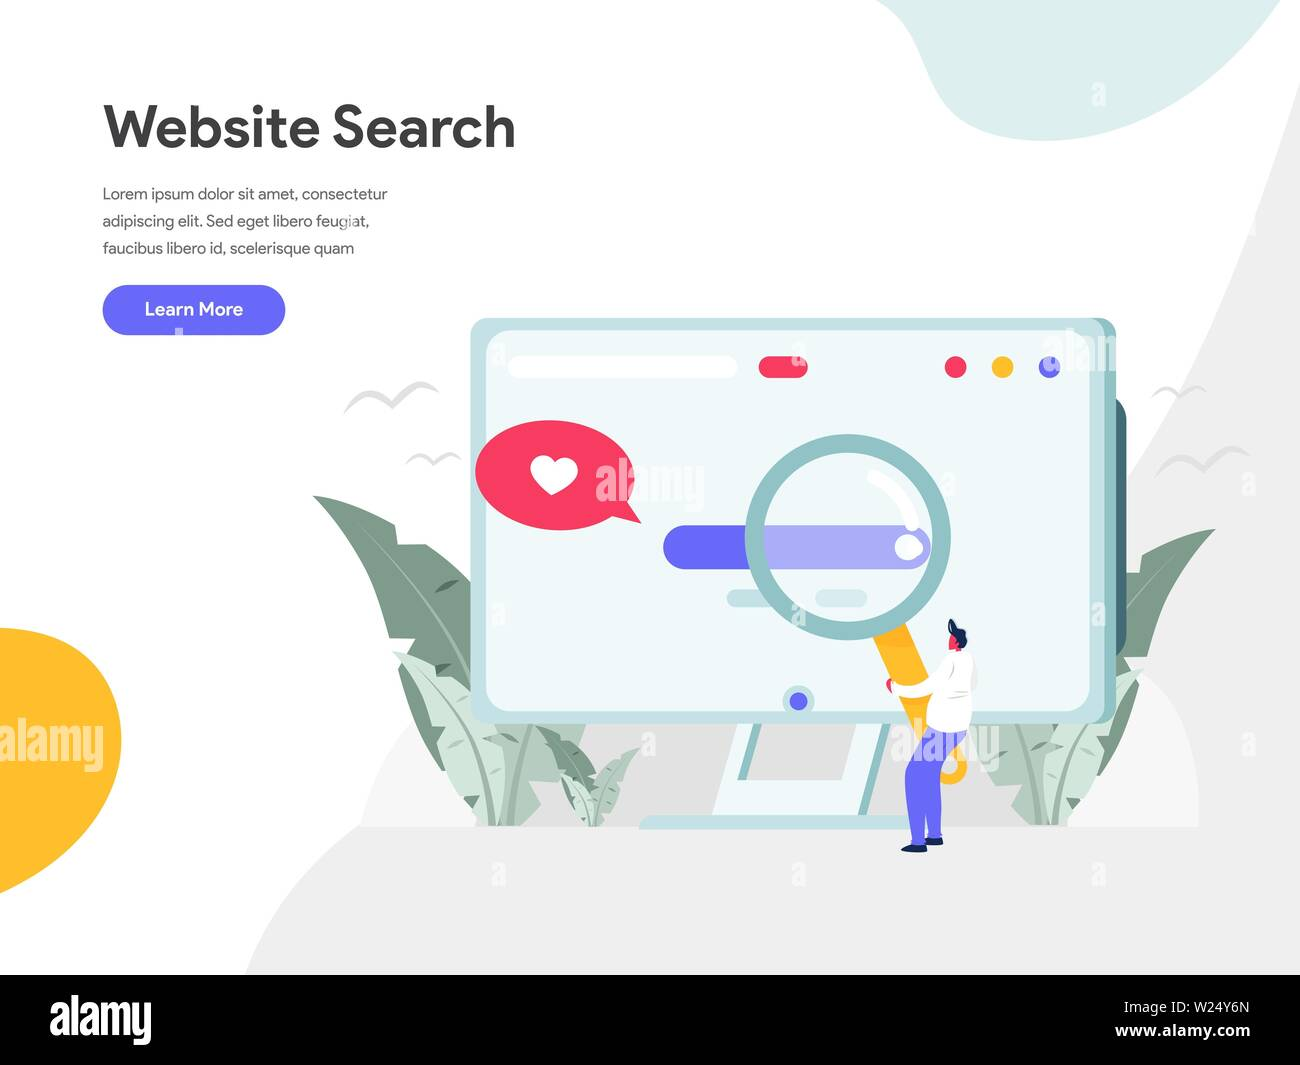 Website Search Illustration Concept. Modern flat design concept of web page design for website and mobile website.Vector illustration EPS 10 - Stock Image